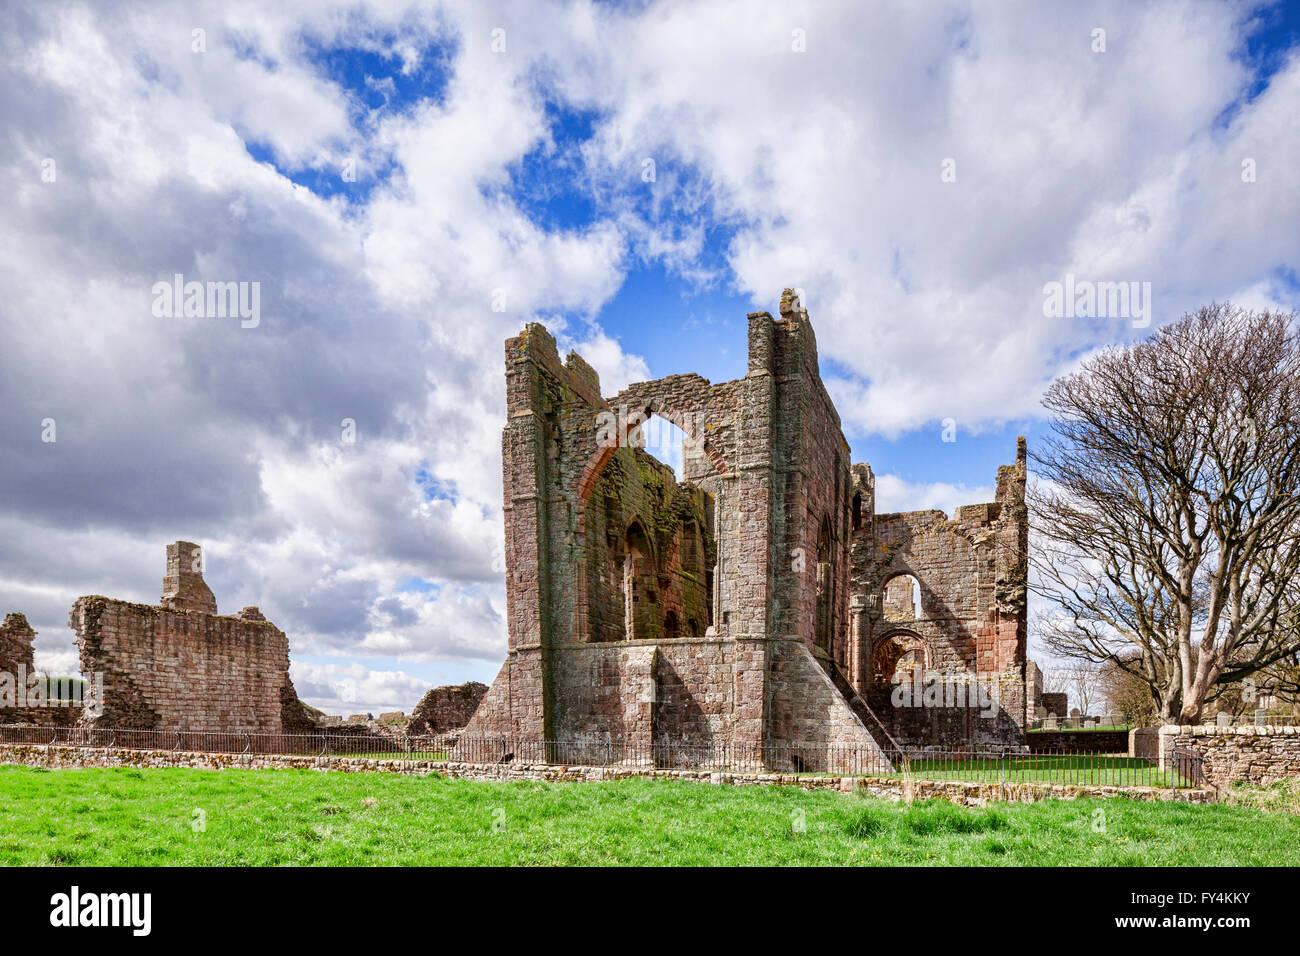 The ruins of Lindisfarne Priory, Holy Island, Northumberland, England, UK - Stock Image